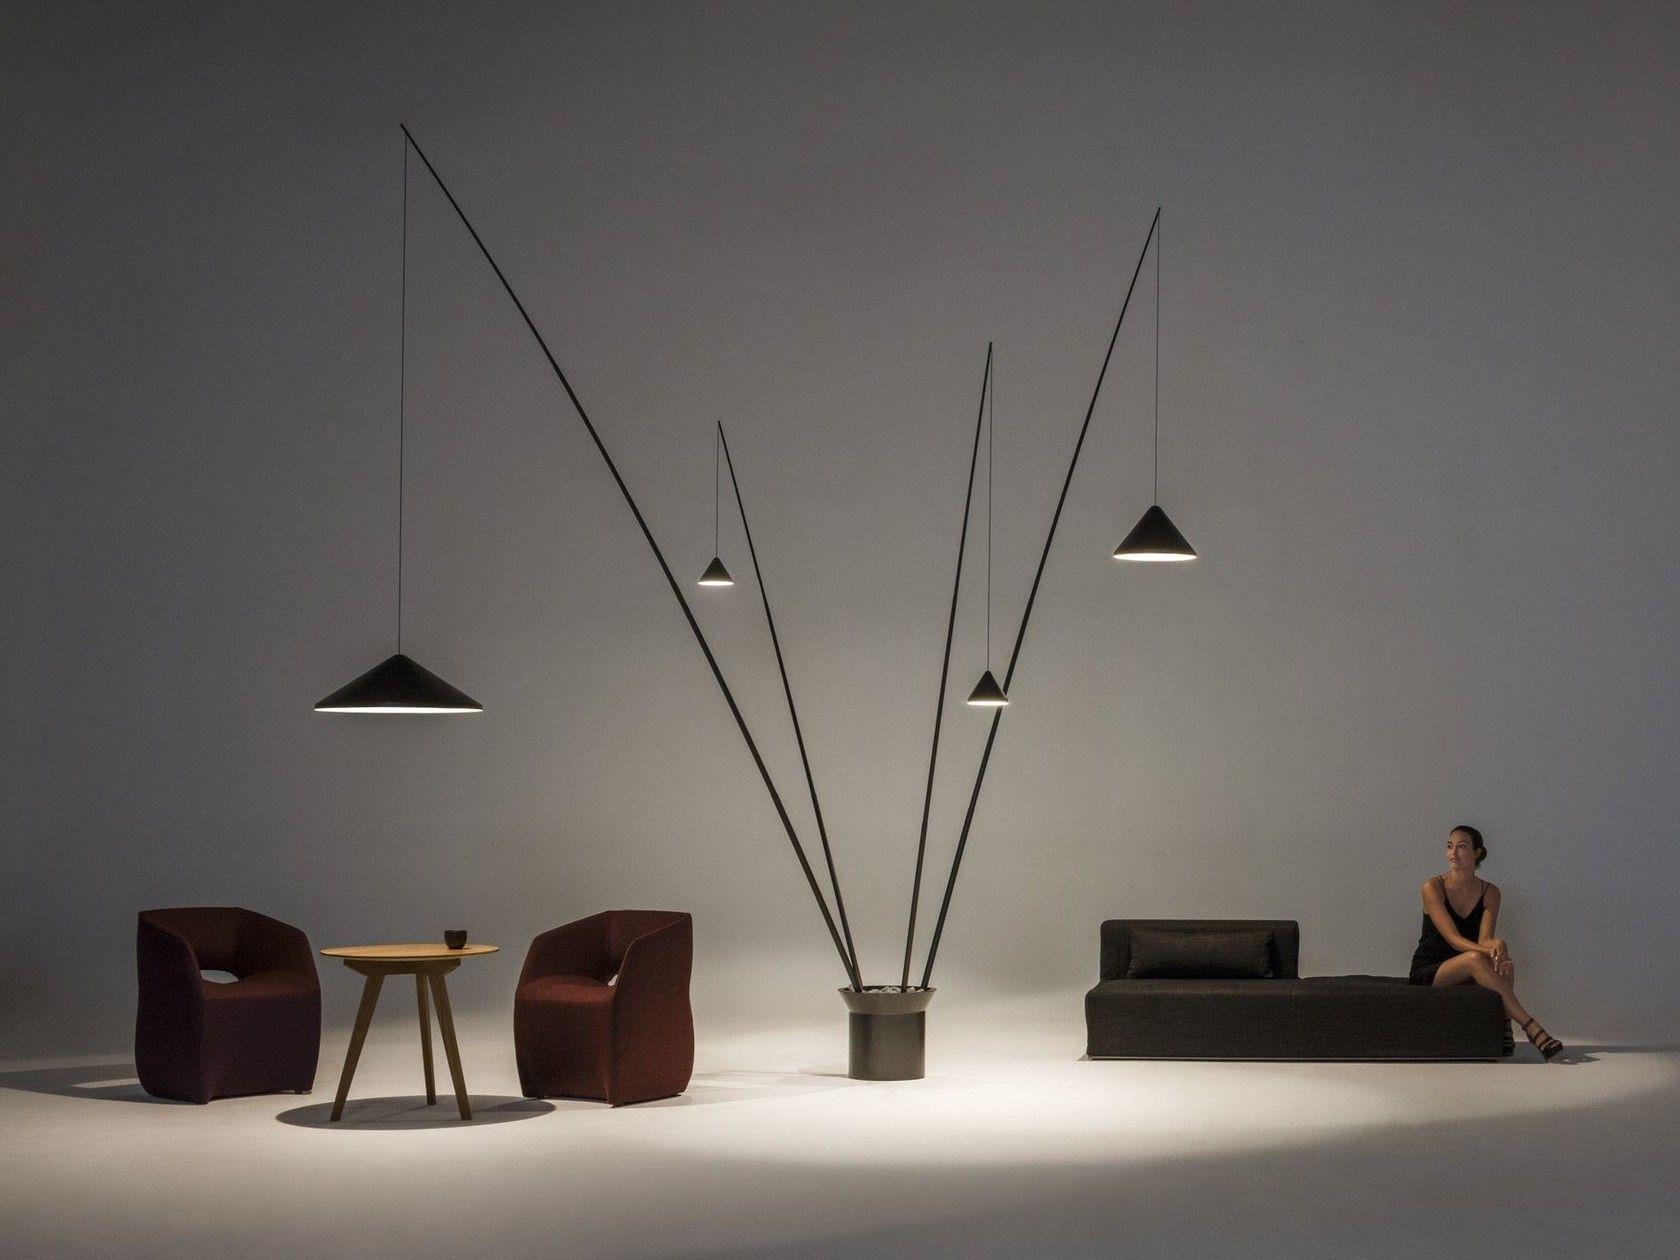 Lampada da terra by reggiani illuminazione on artnet